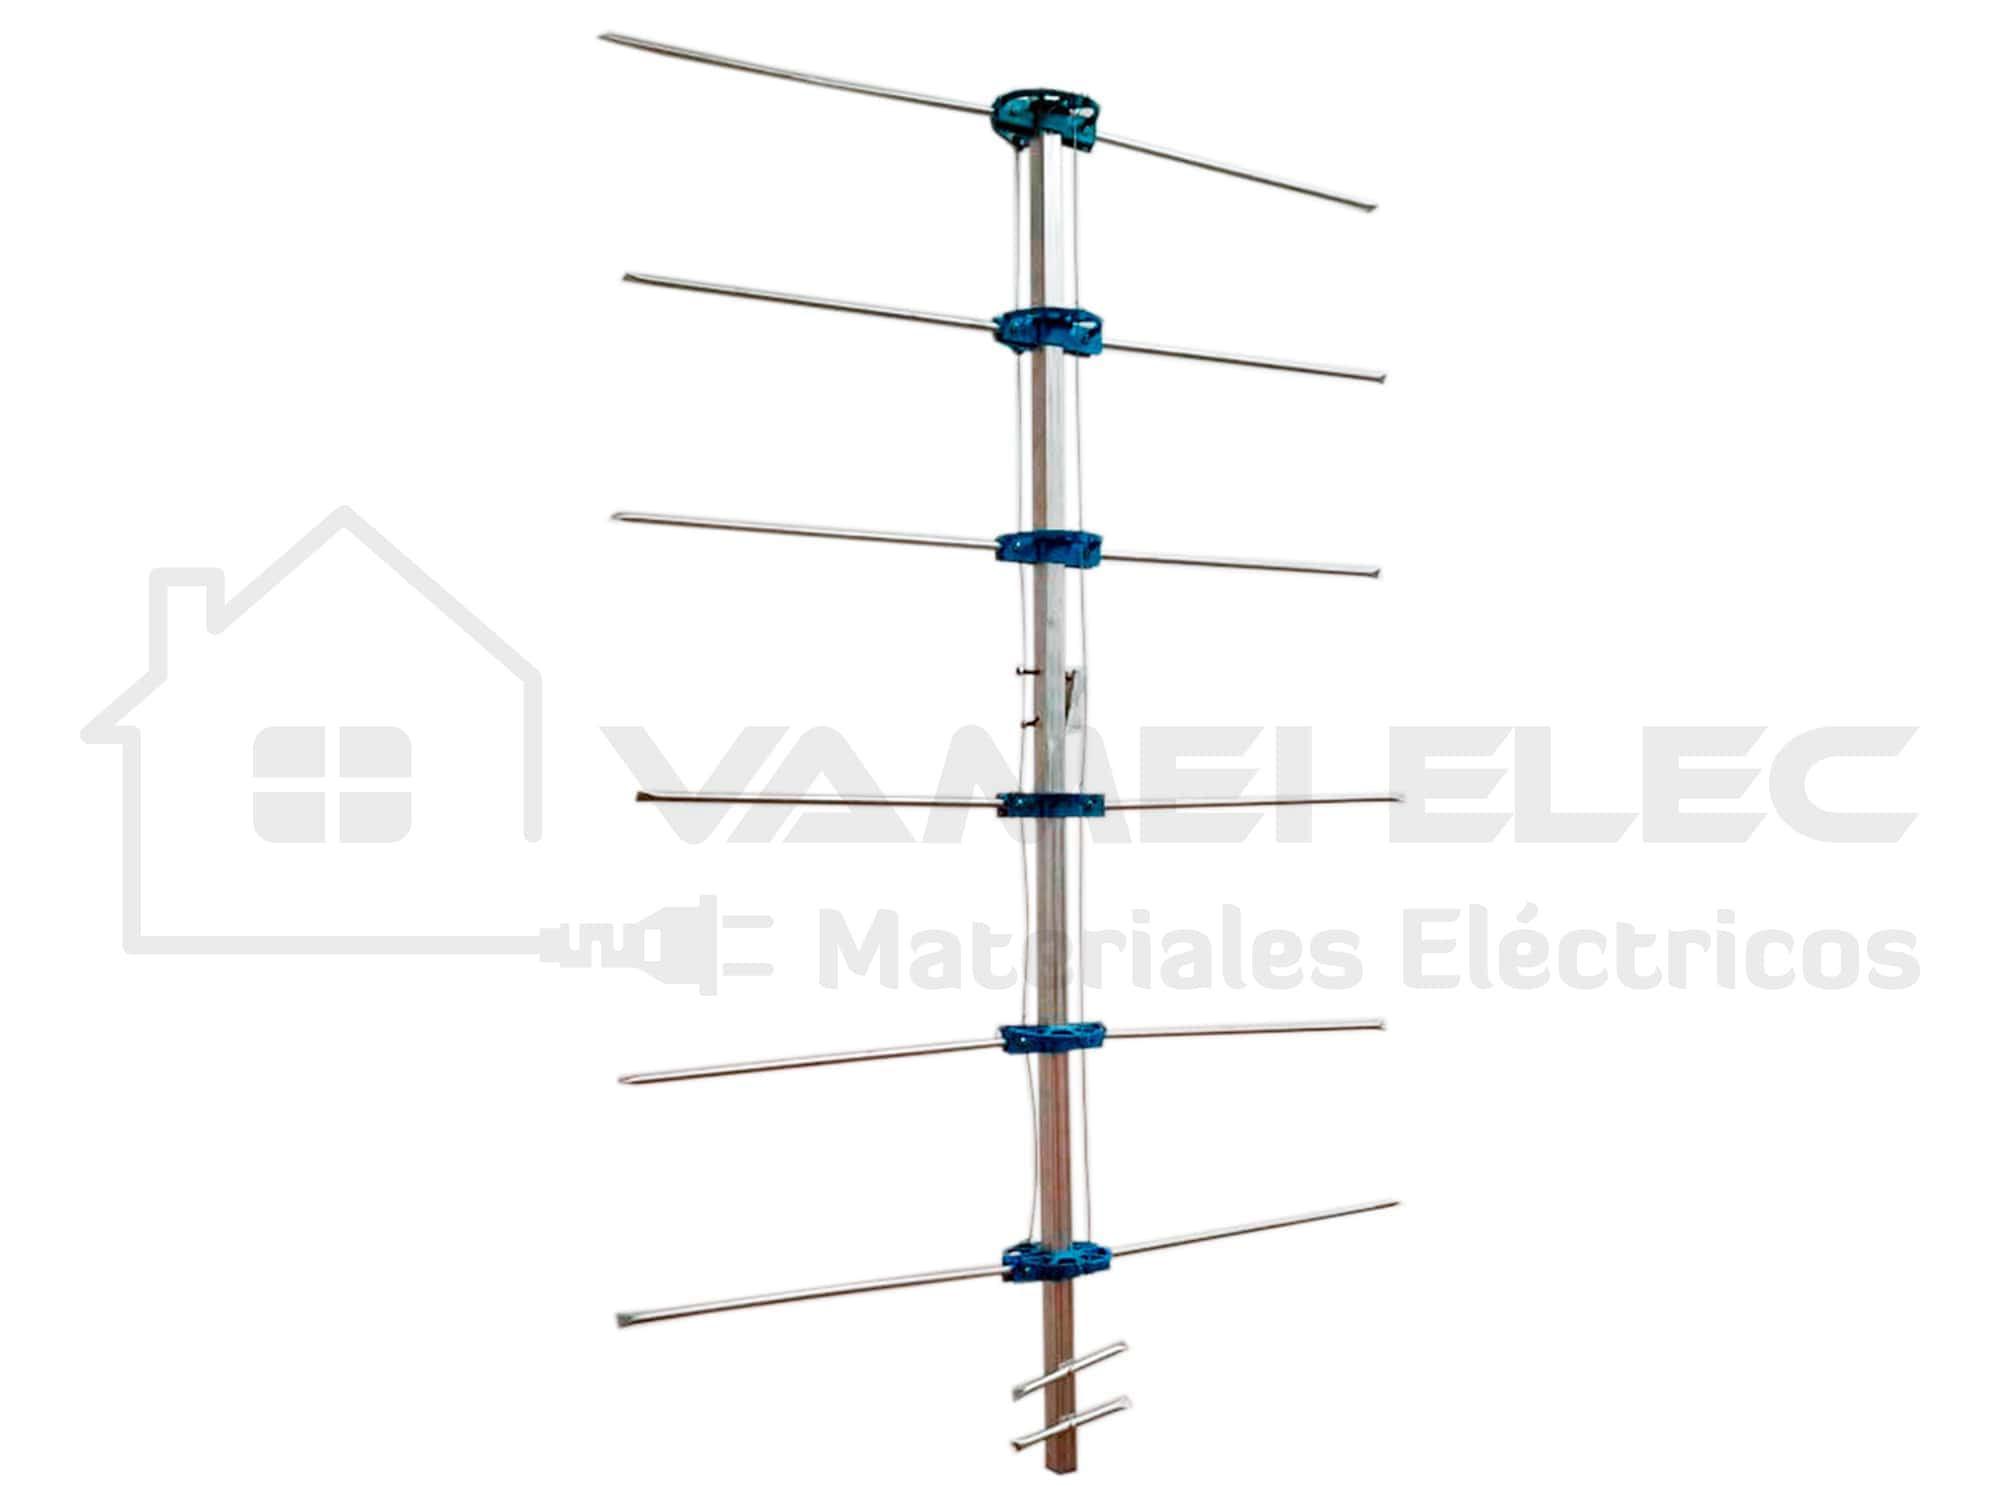 VAMEI Elec - Antenas - Antenas 8 Elementos